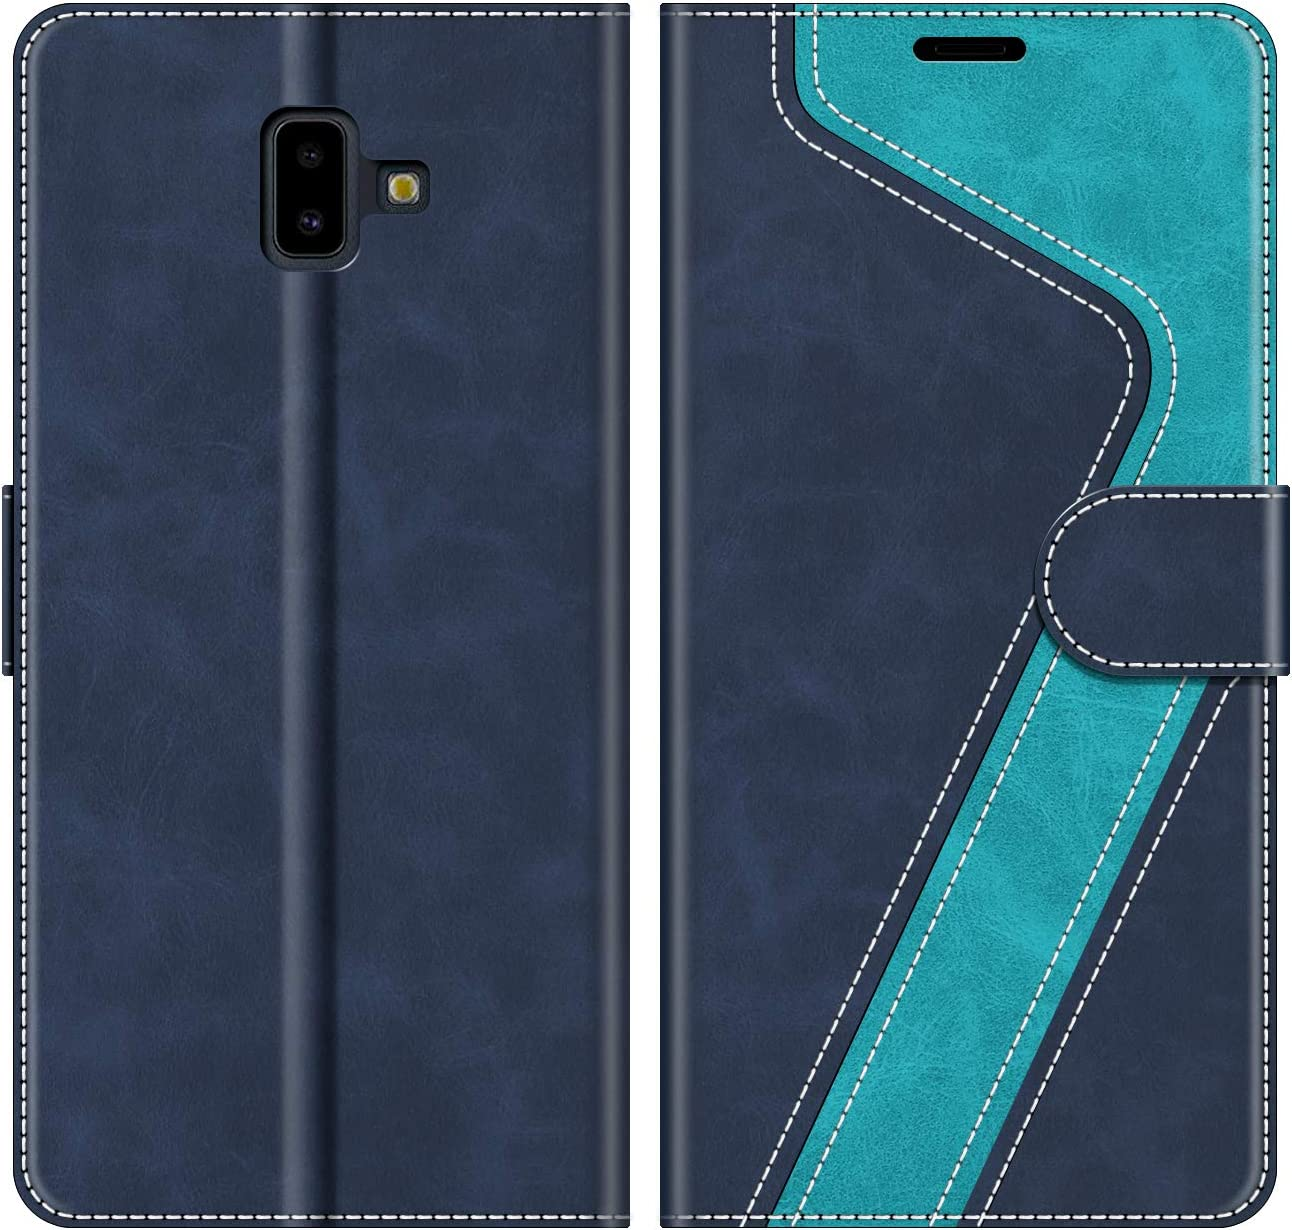 MOBESV Funda para Samsung Galaxy J6 Plus, Funda Libro Samsung J6 Plus, Funda Móvil Samsung Galaxy J6 Plus Magnético Carcasa para Samsung Galaxy J6 Plus 2018 Funda con Tapa, Azul